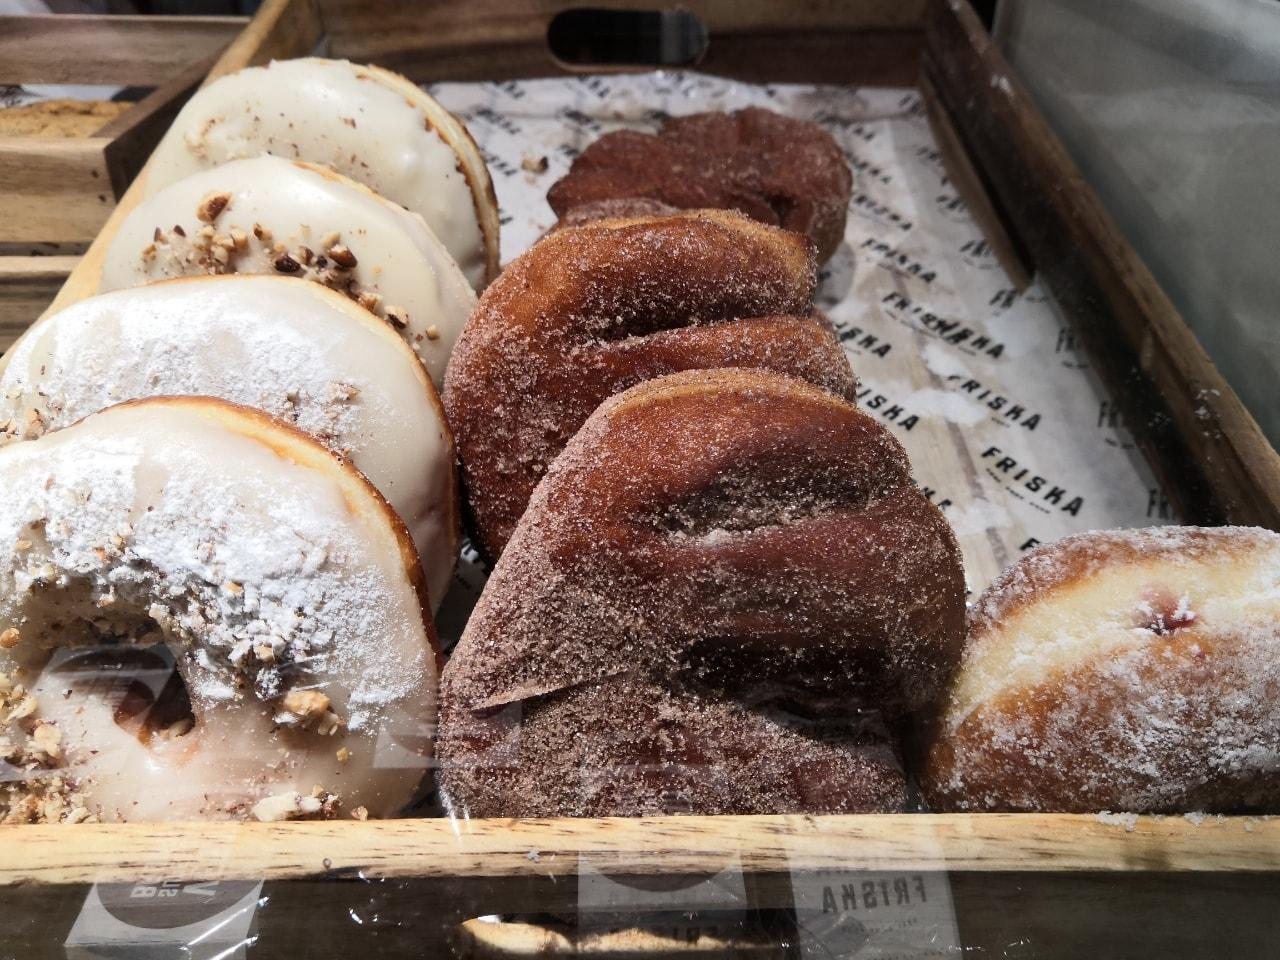 Friska Cakes/Doughnuts